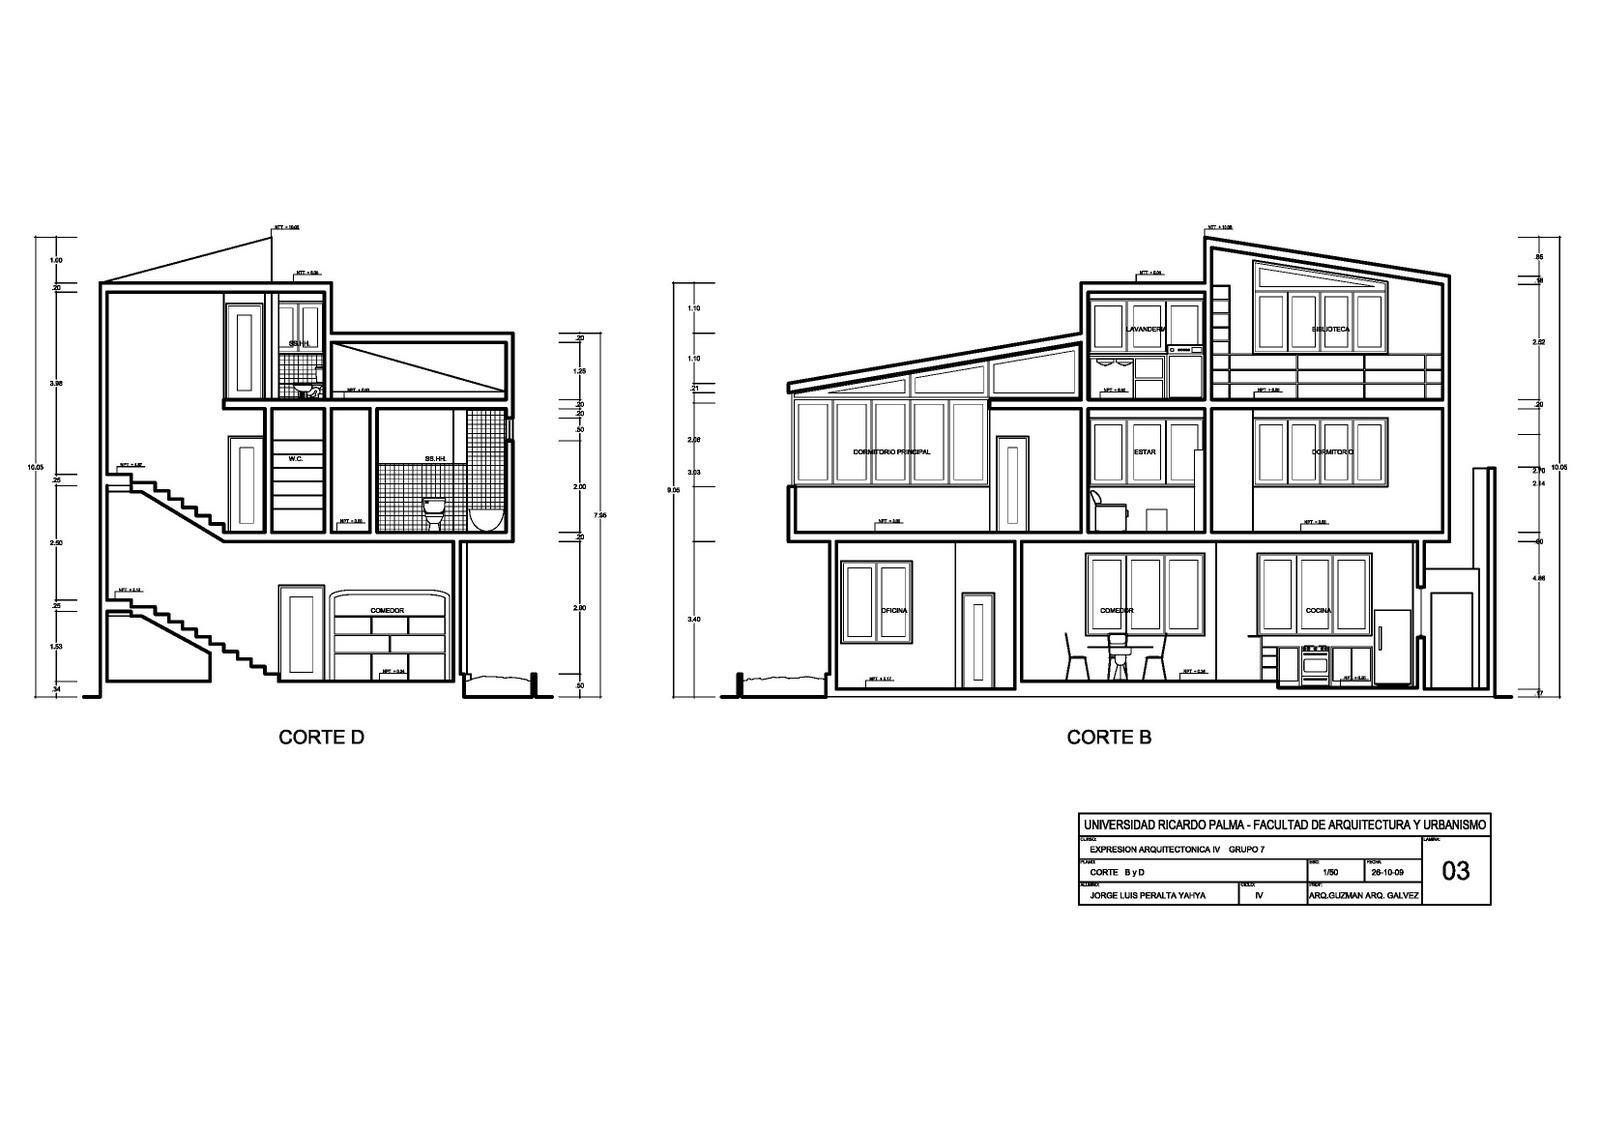 Expresi n arquitect nica 4 planos de arquitectura for Clasificacion de los planos arquitectonicos